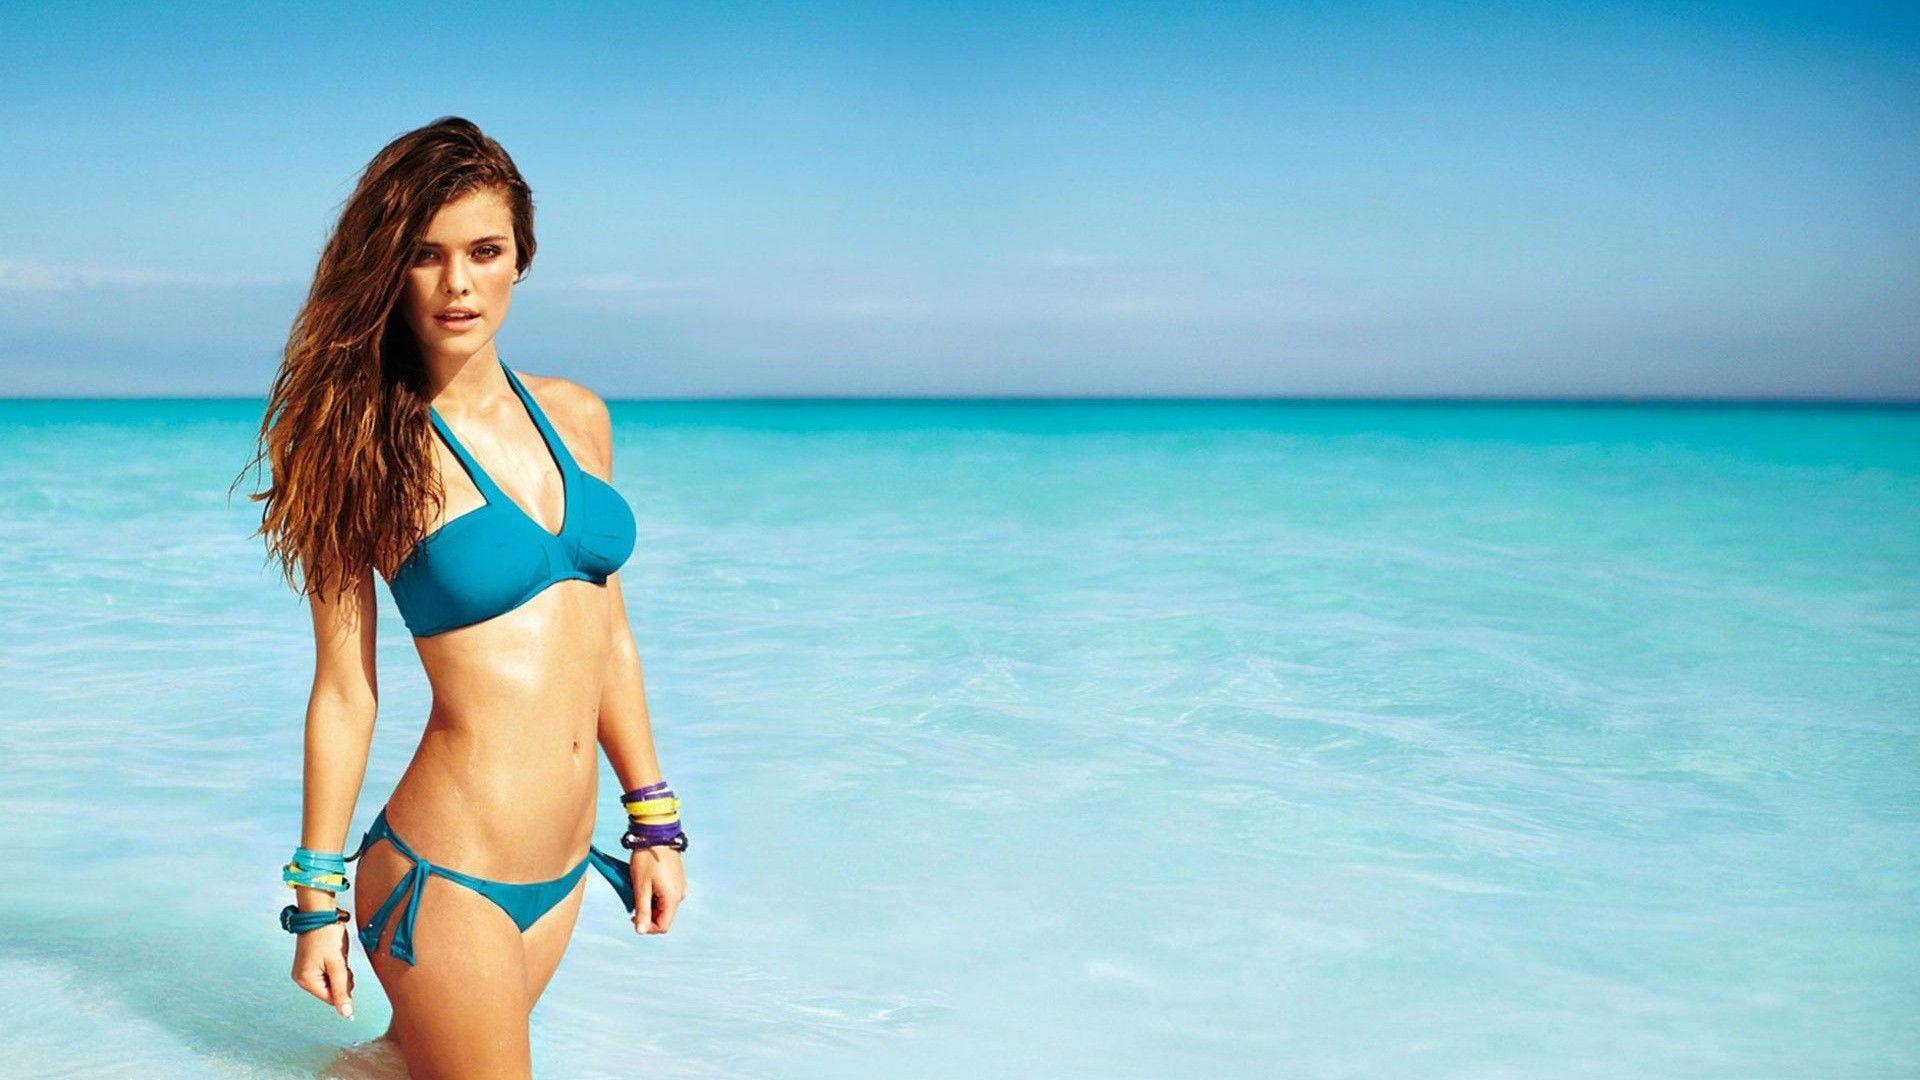 Bikini girl backgrounds